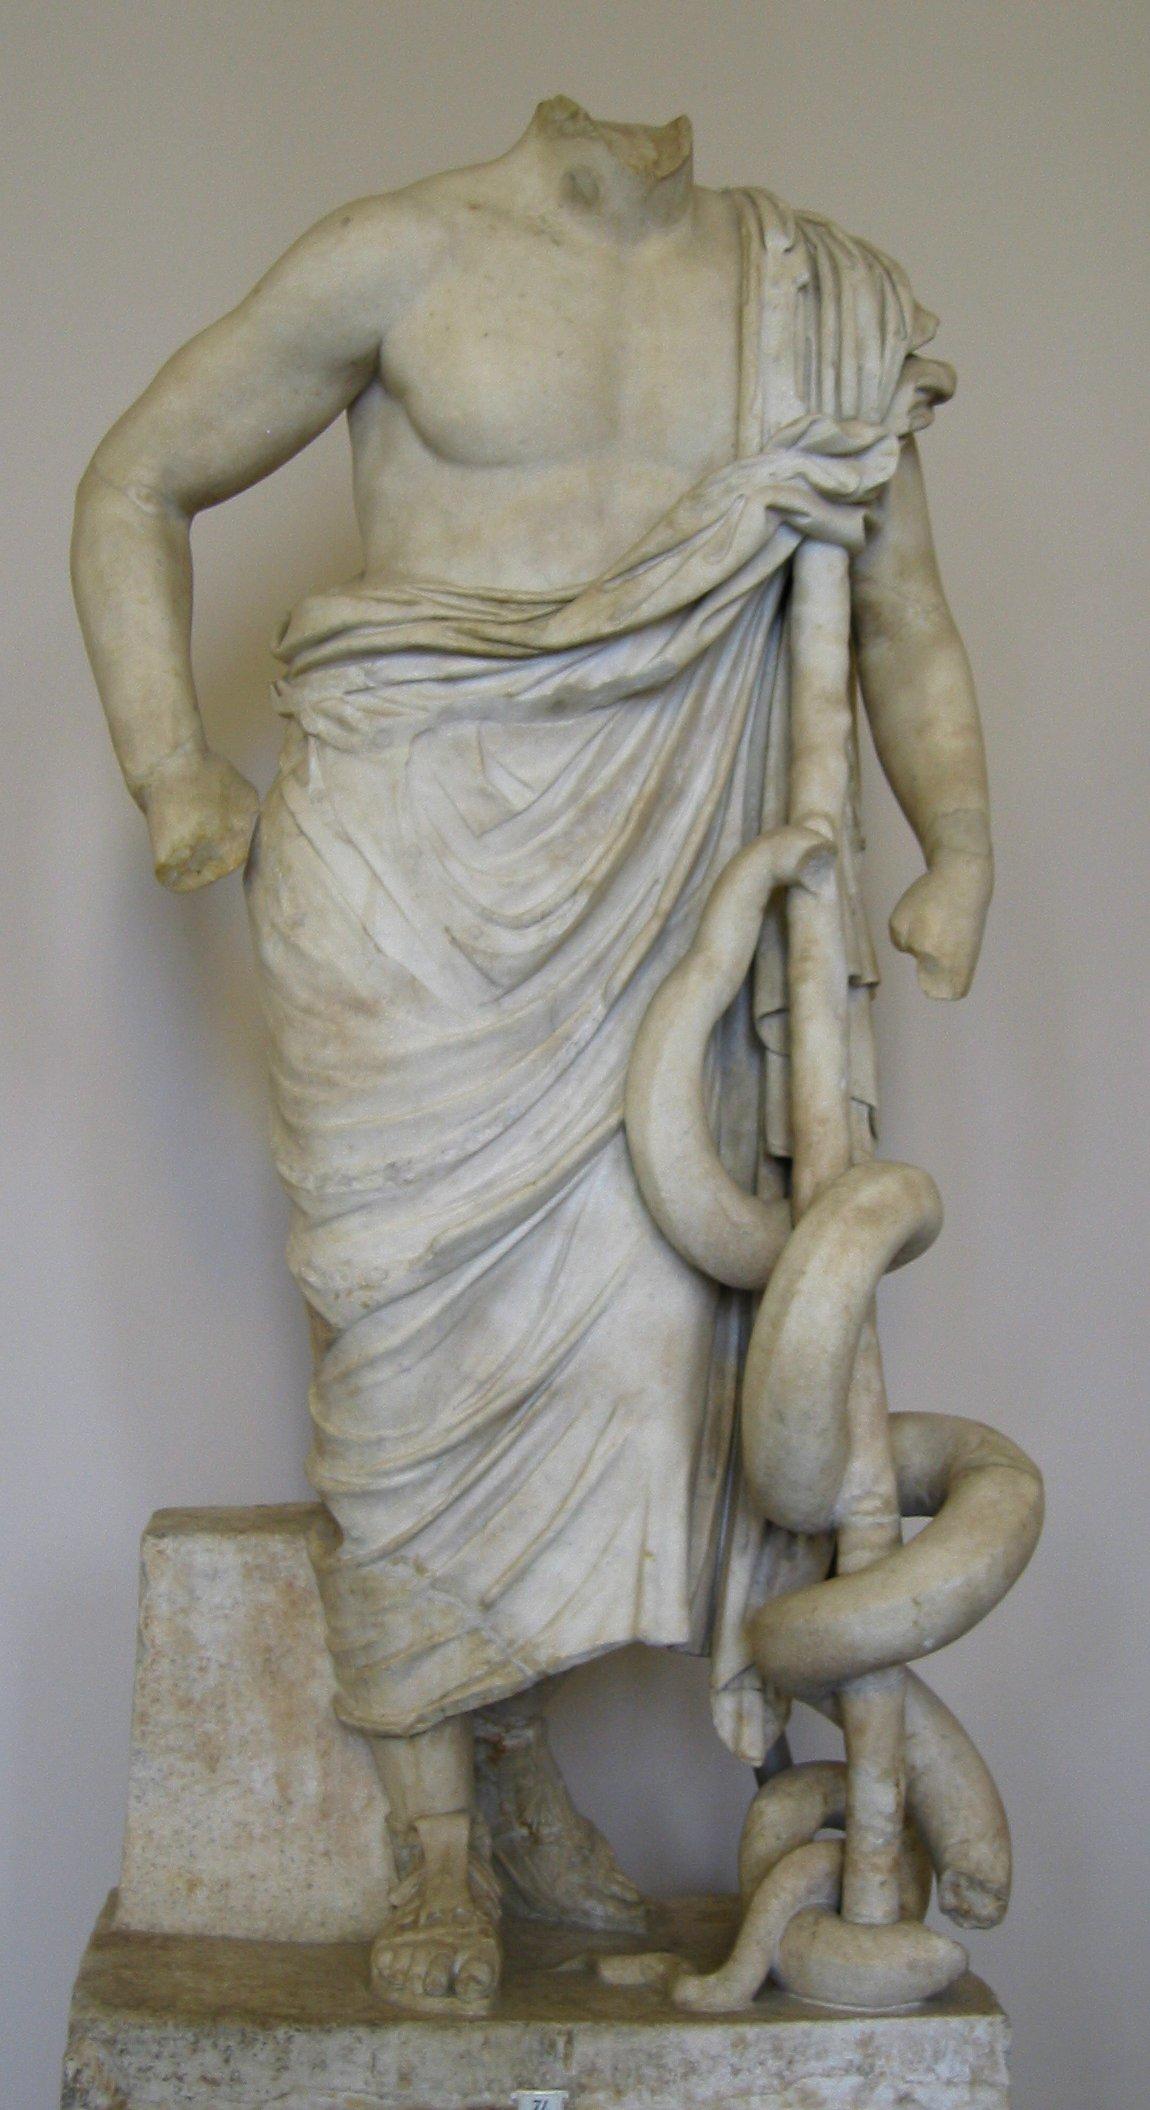 Istorija medicine 2005-12-28_Berlin_Pergamon_museum_Statue_of_Asklepios